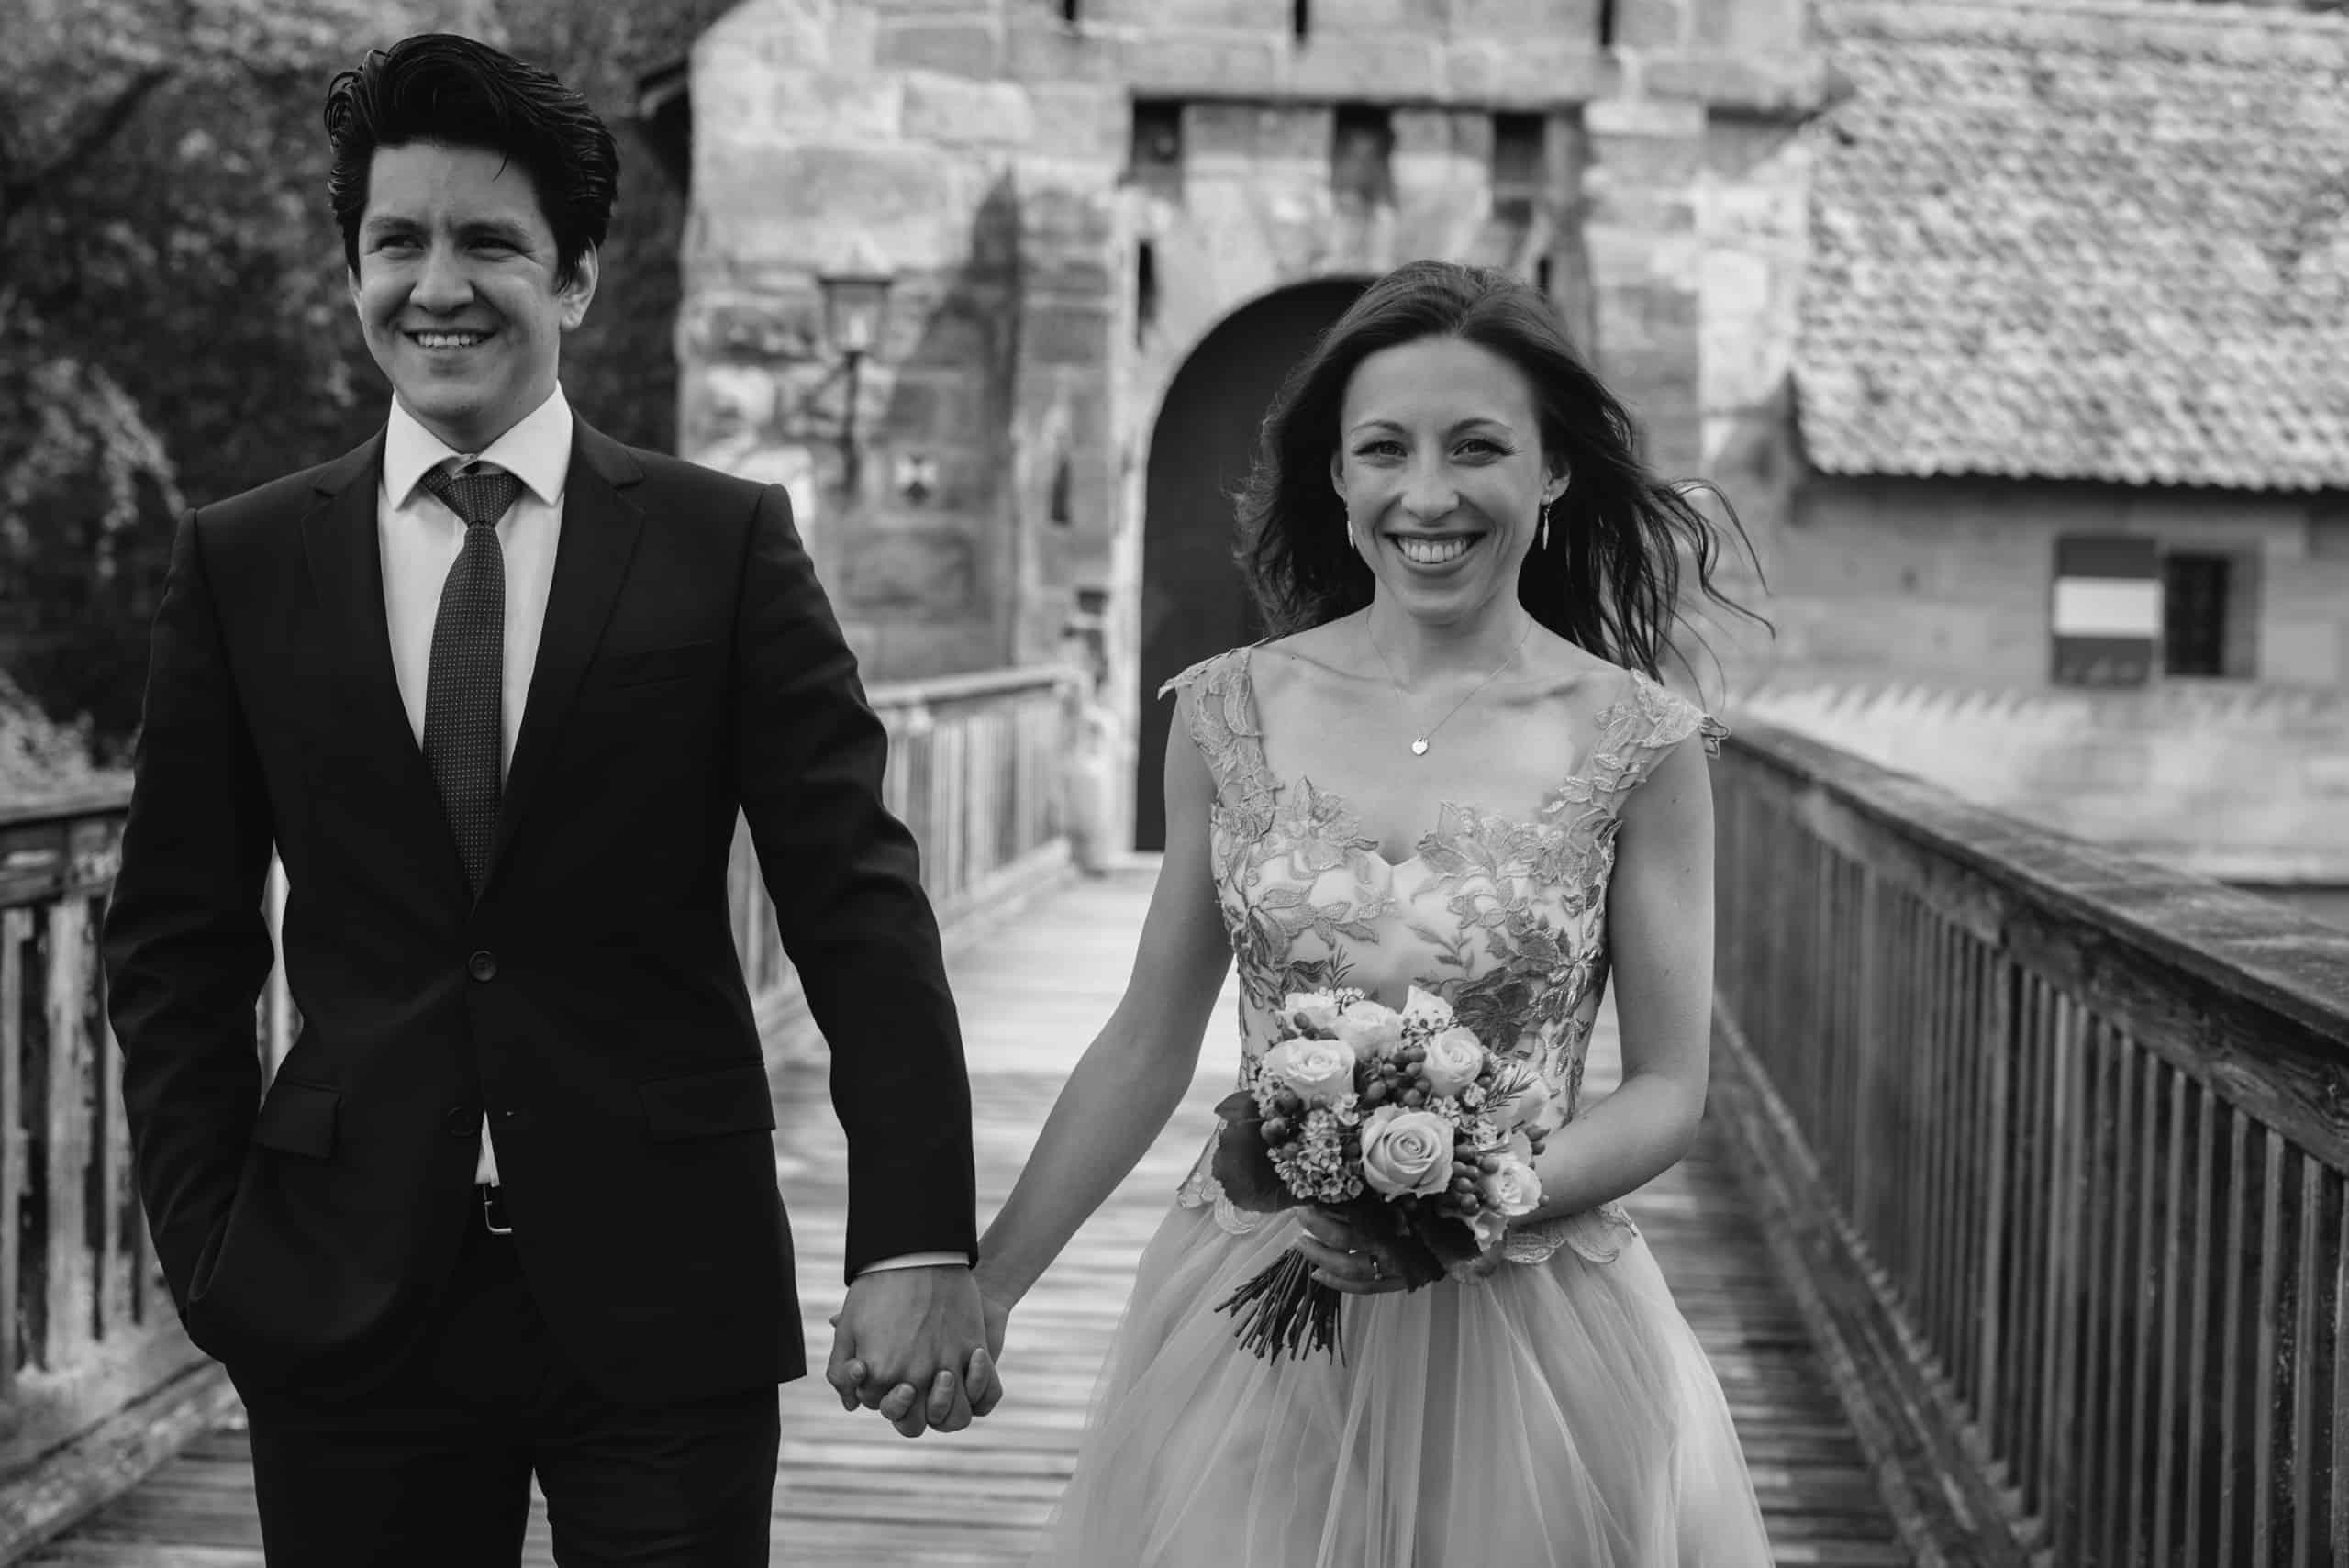 Wedding In Lauf Castle 02